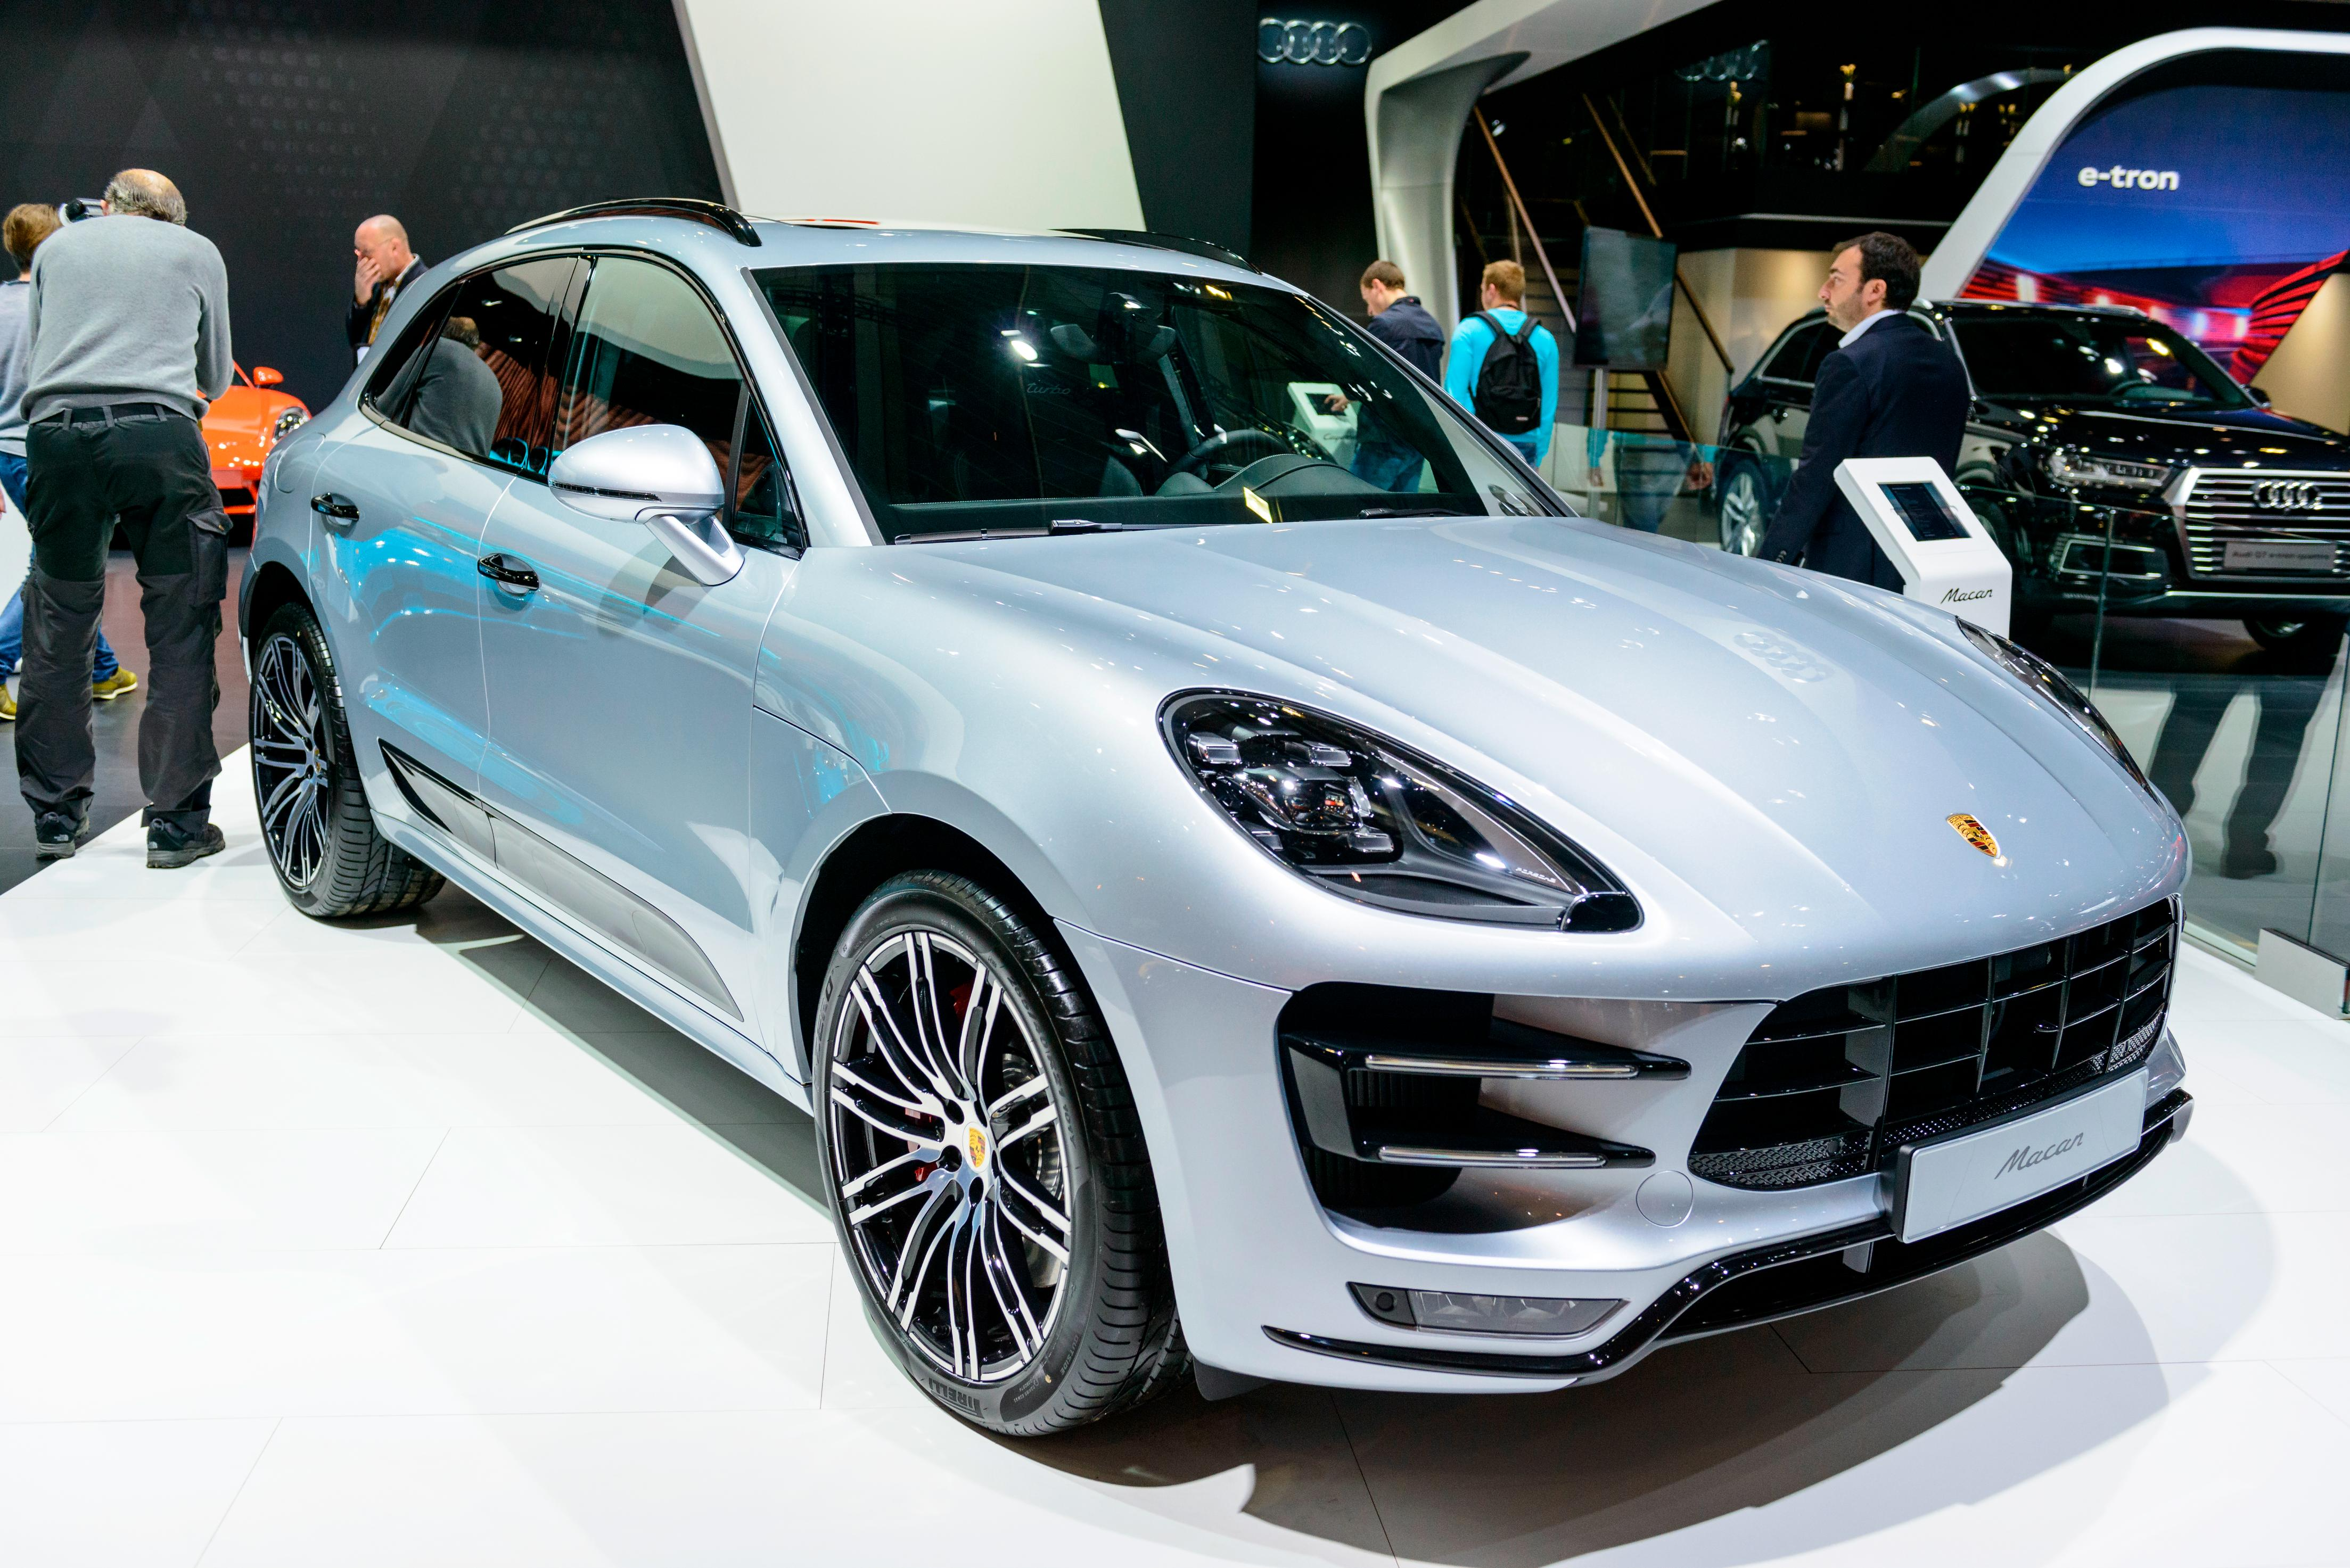 Porsche Macan Carmaker S Most Popular Model Is Going Electric